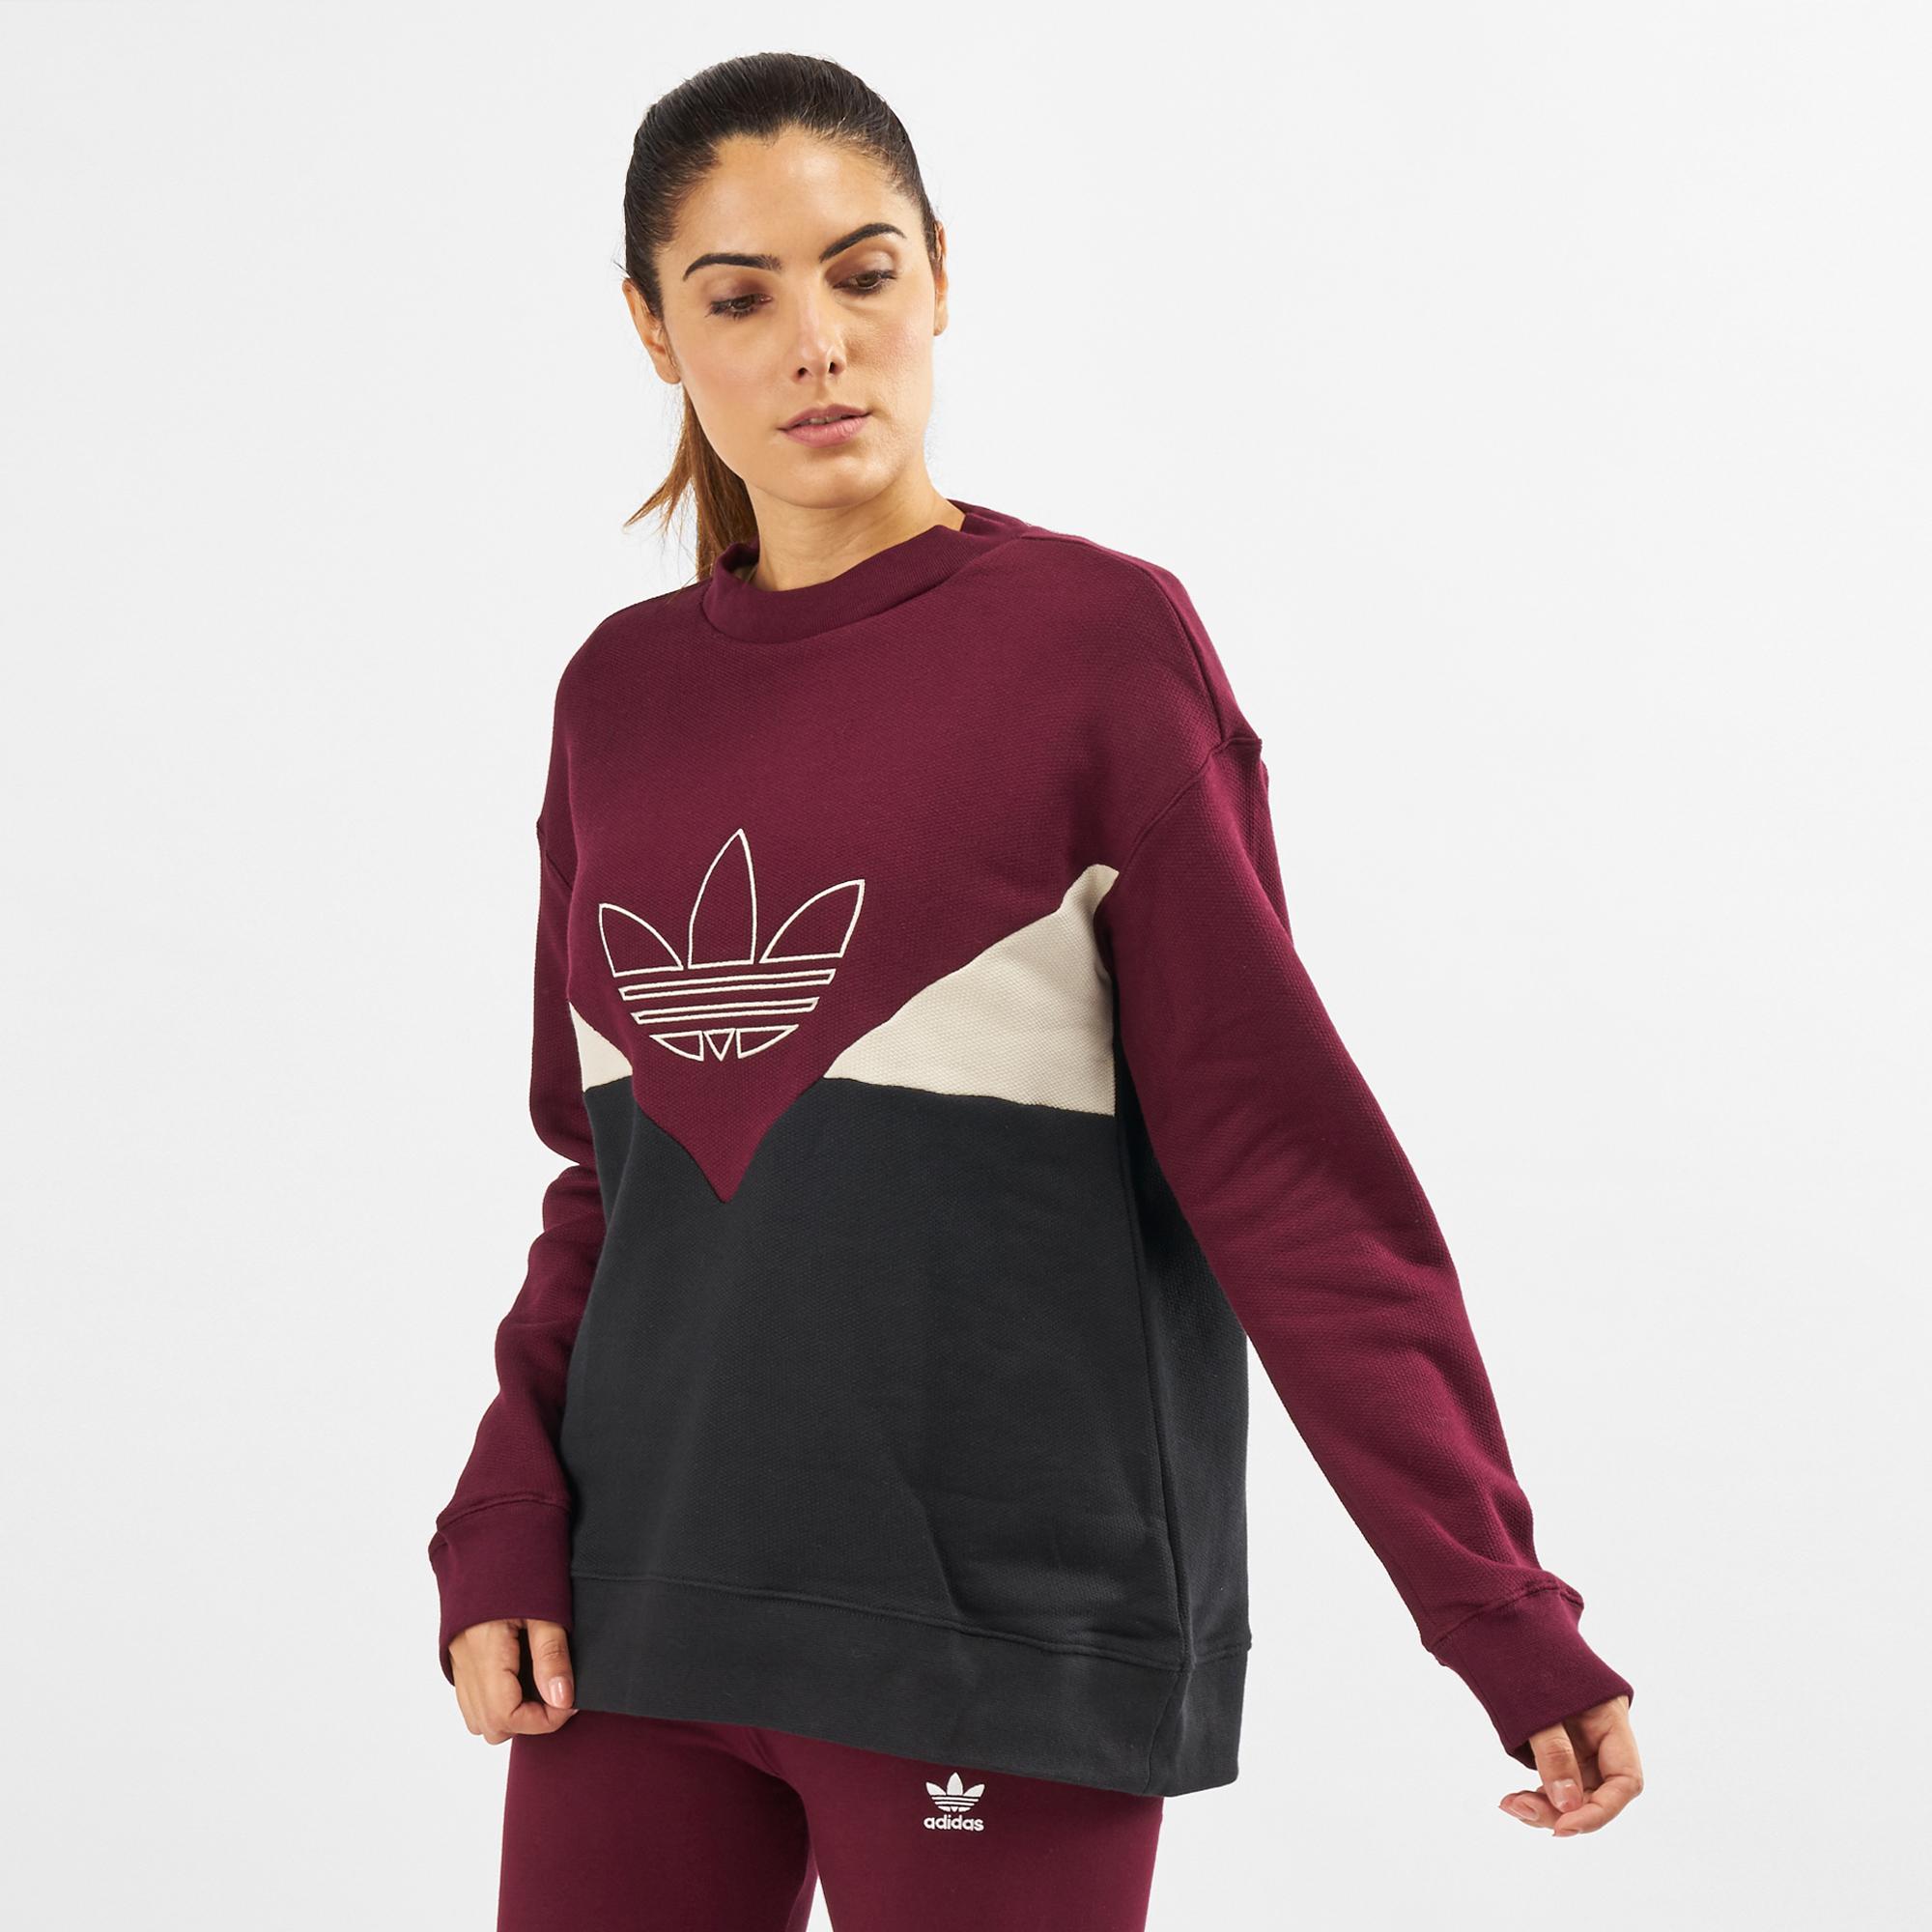 ADIDAS ORIGINALS Damen Kapuzensweatshirt »CLRDO HOODY